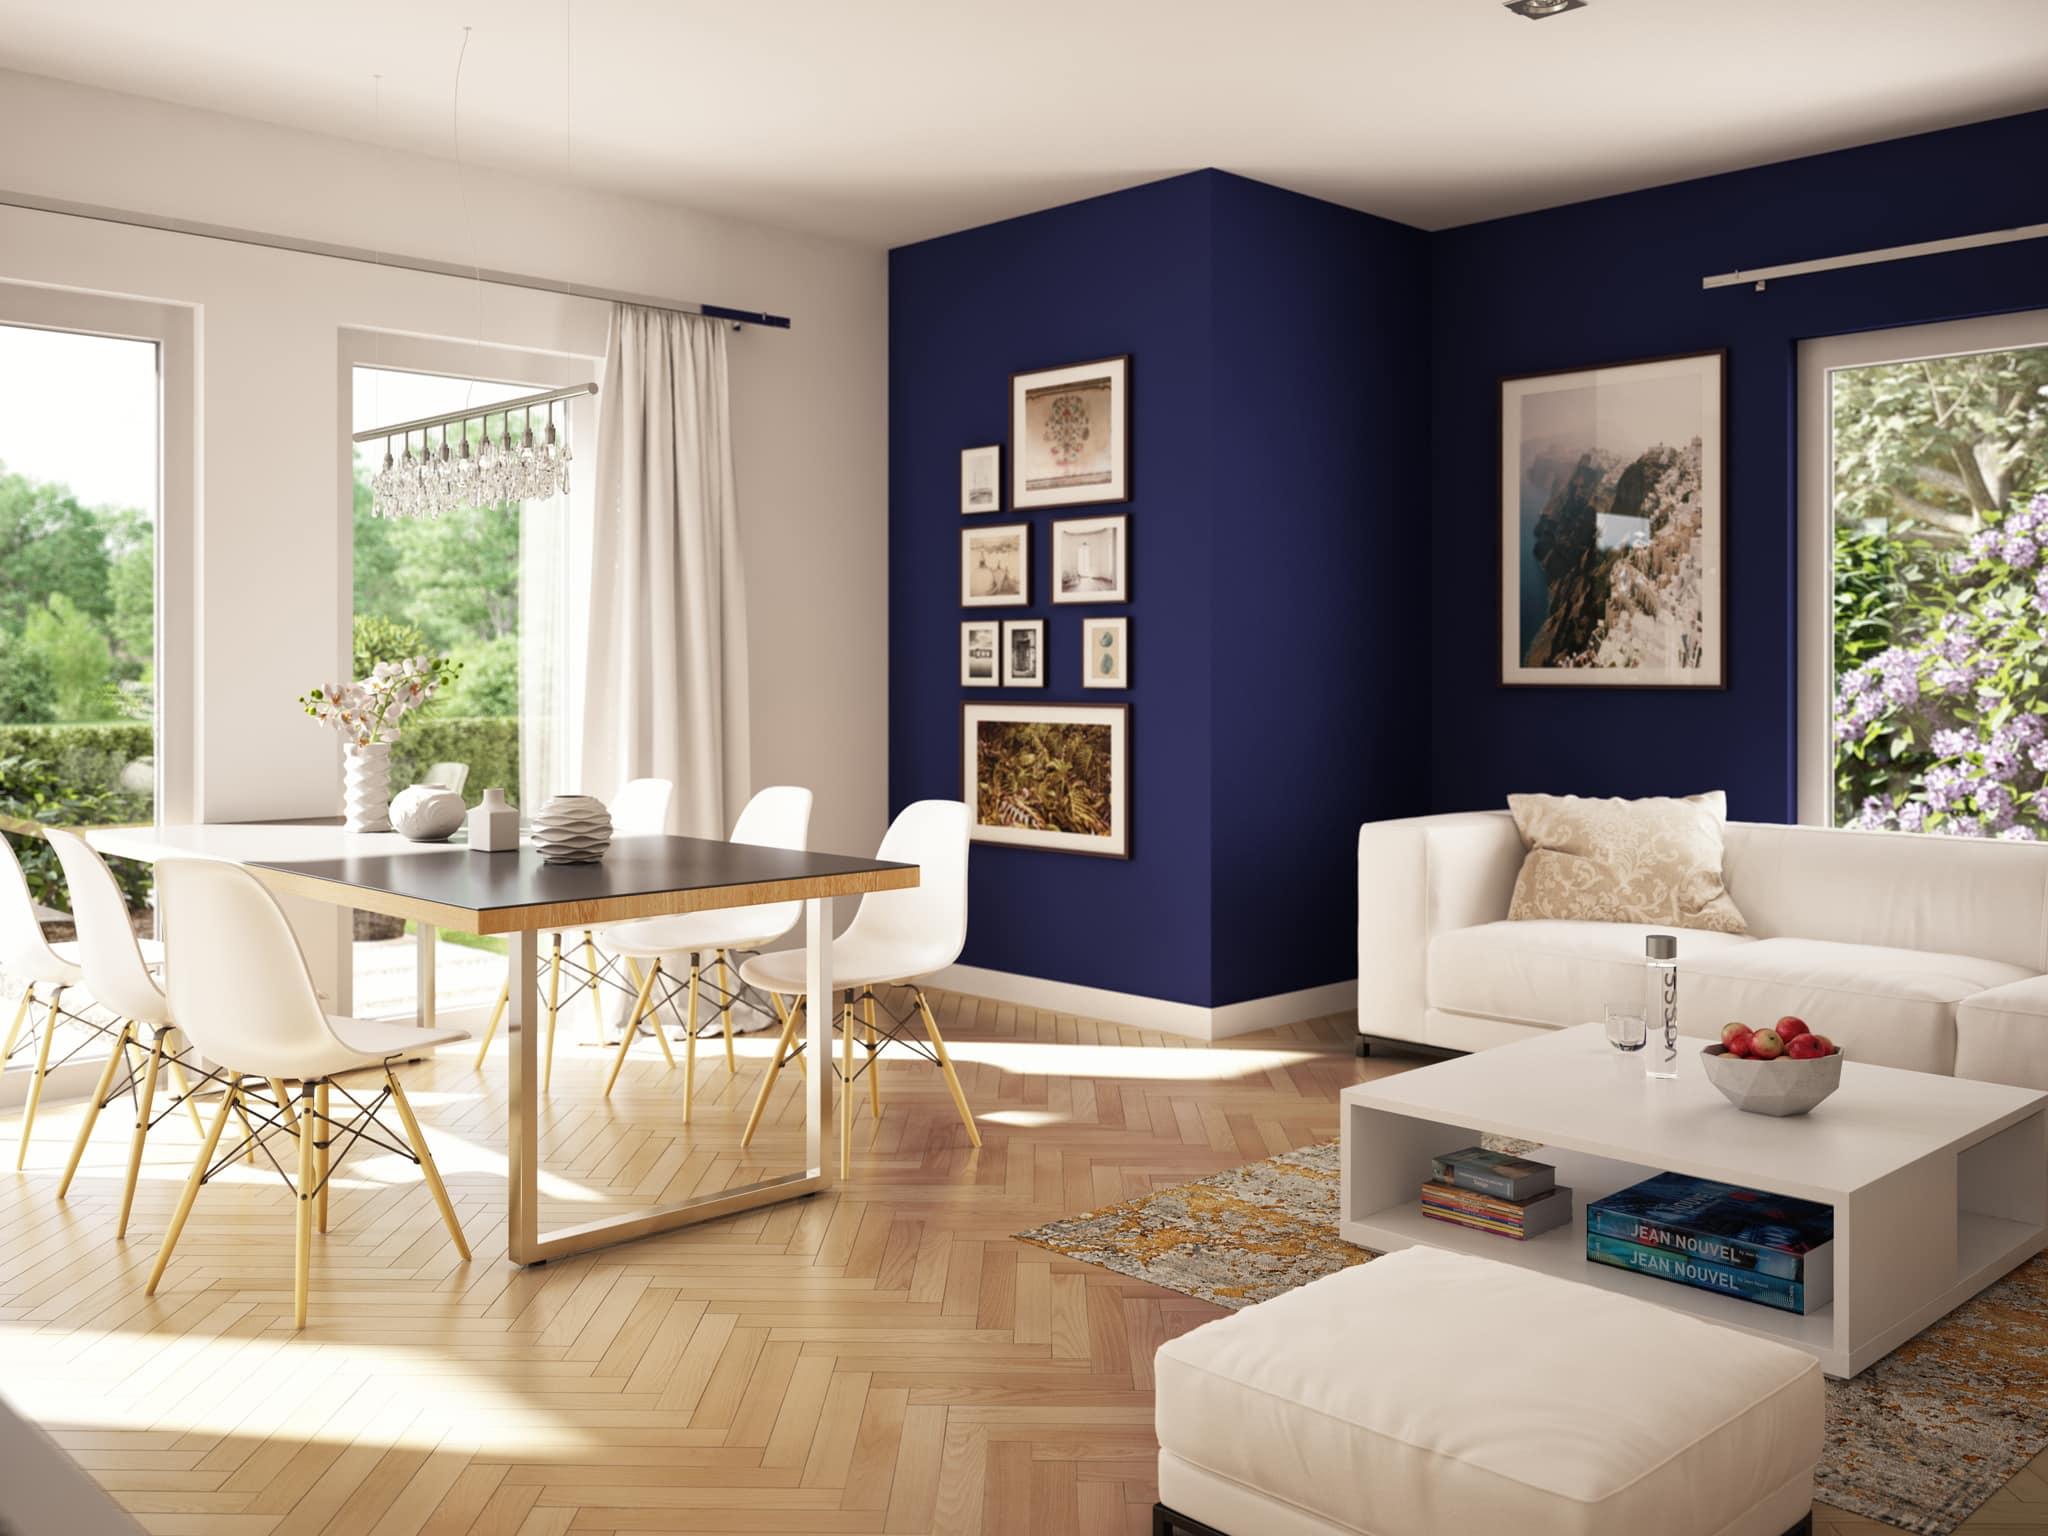 Wohnzimmer - Einrichtung Ideen Fertighaus Living Haus SUNSHINE 136 V6 - HausbauDirekt.de